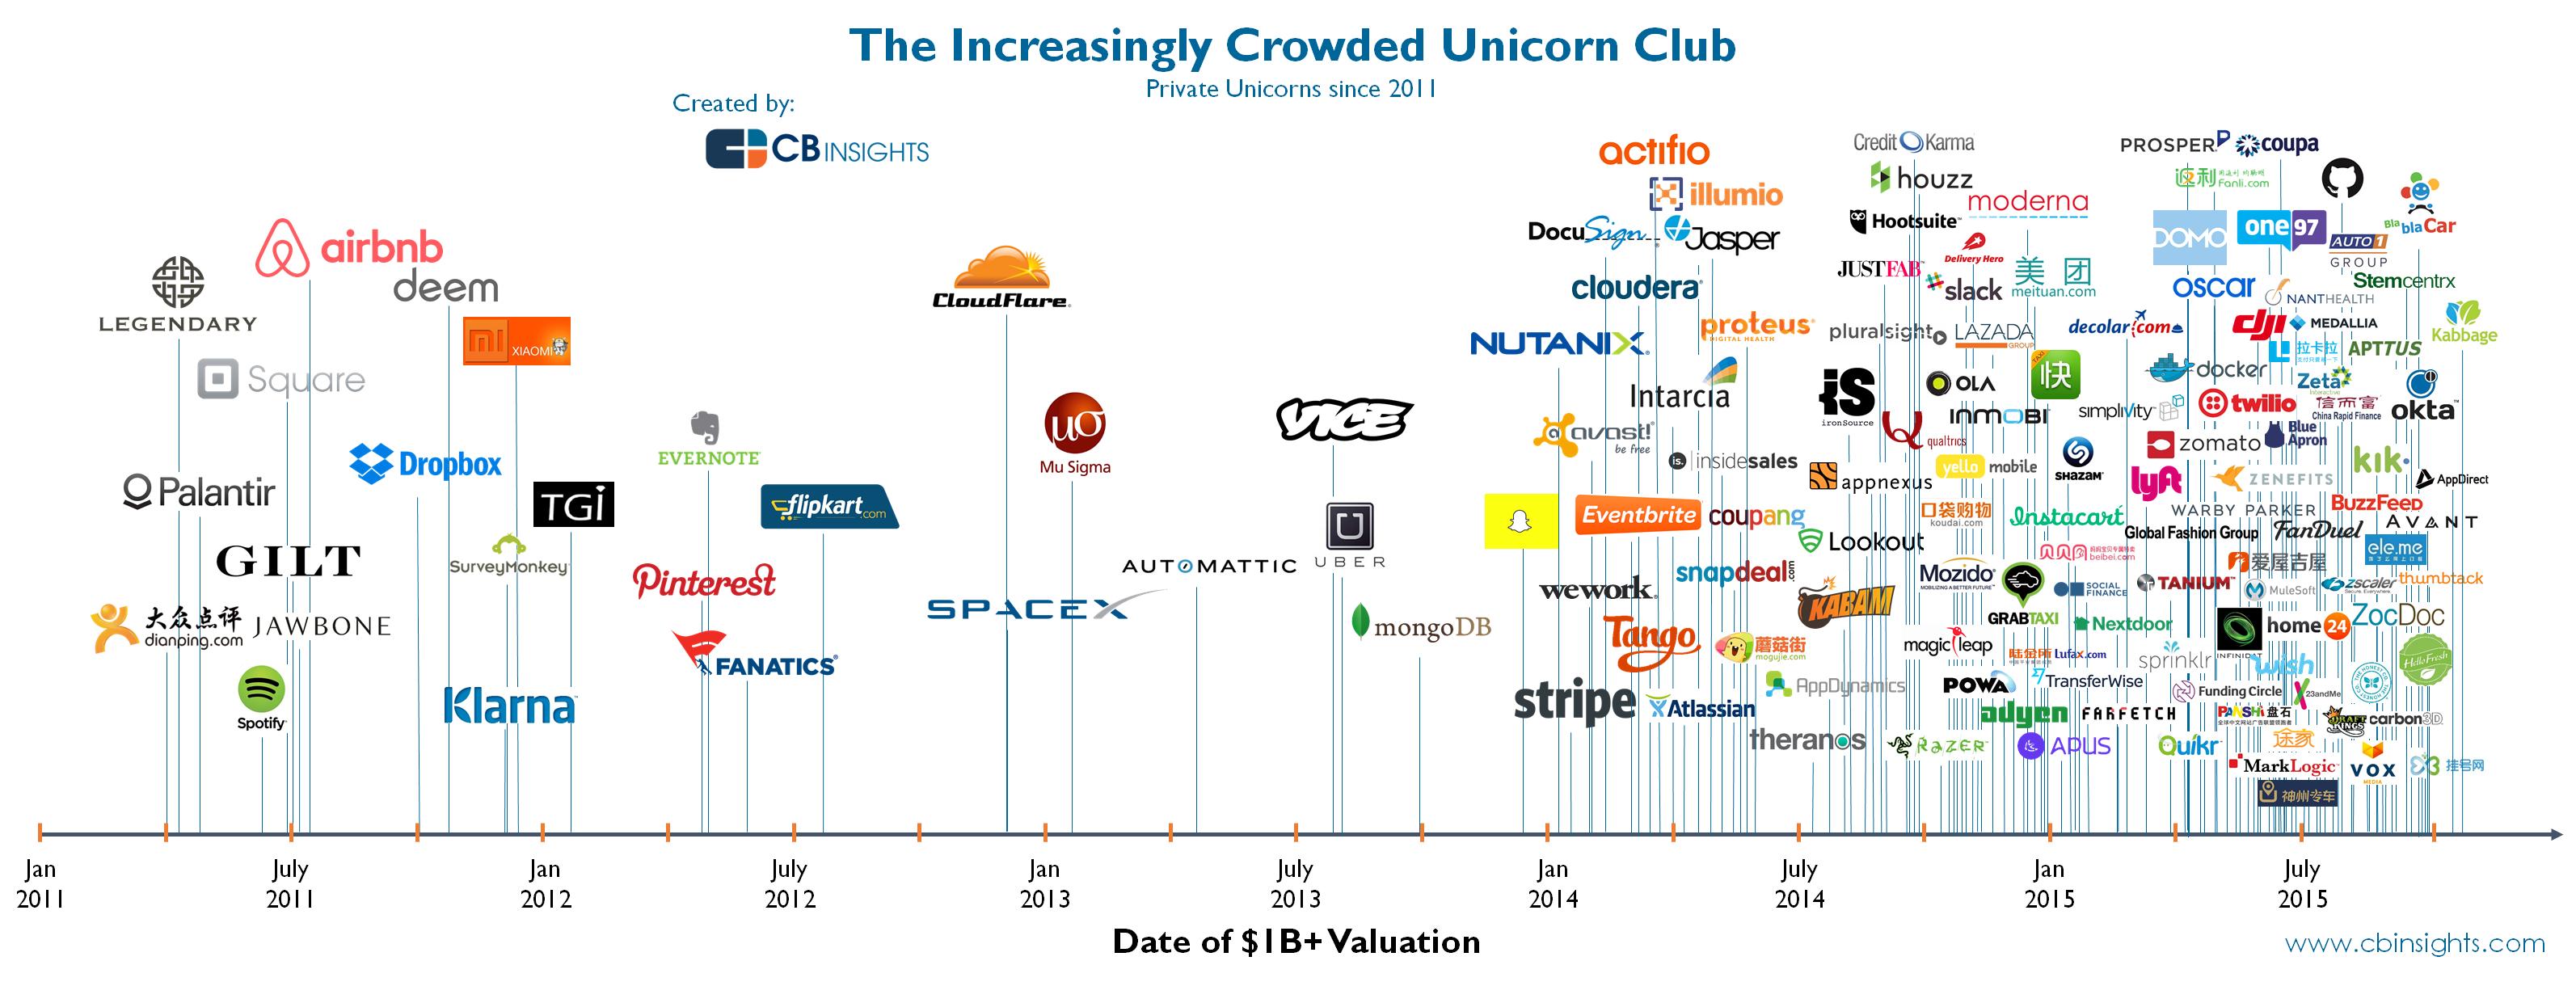 The Increasingly Crowded Unicorn Club Currently At 141 In One Infographic Http Flip It 7roj5 Unicorn Companies Unicorn Club Unicorn